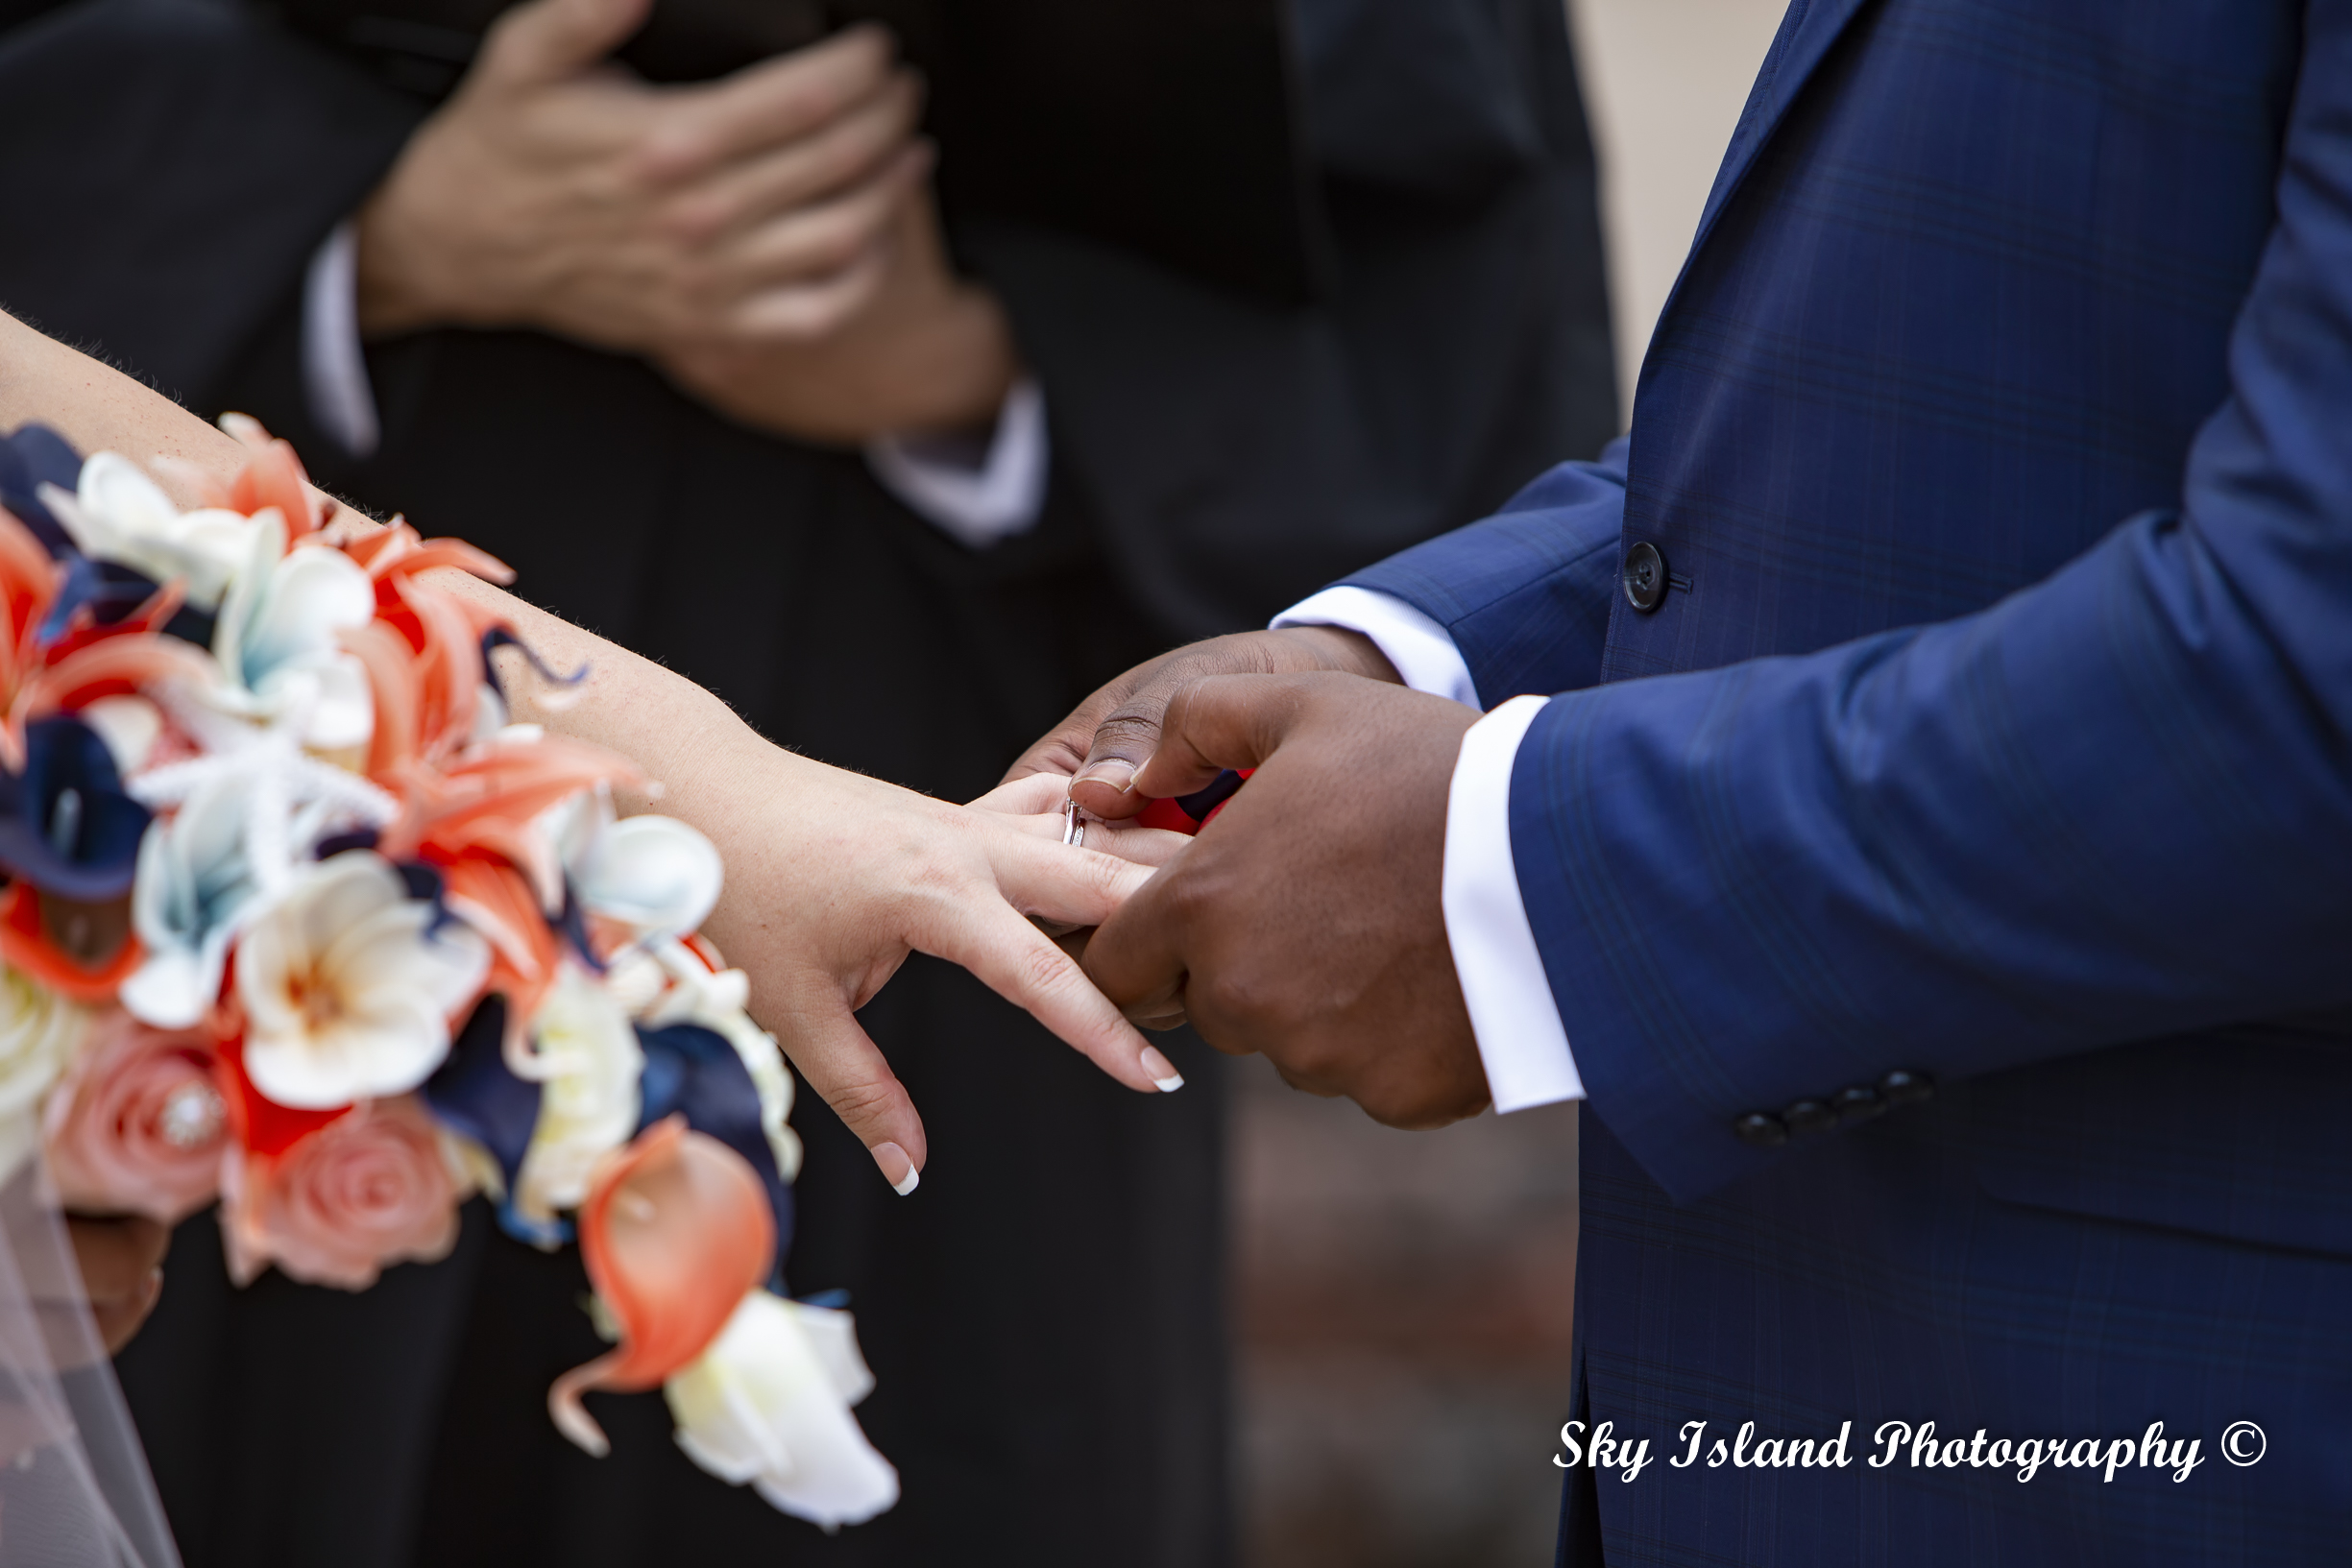 Wedding day Groom taking Bride Hands sky Island photography John Heyward Baltimore Md